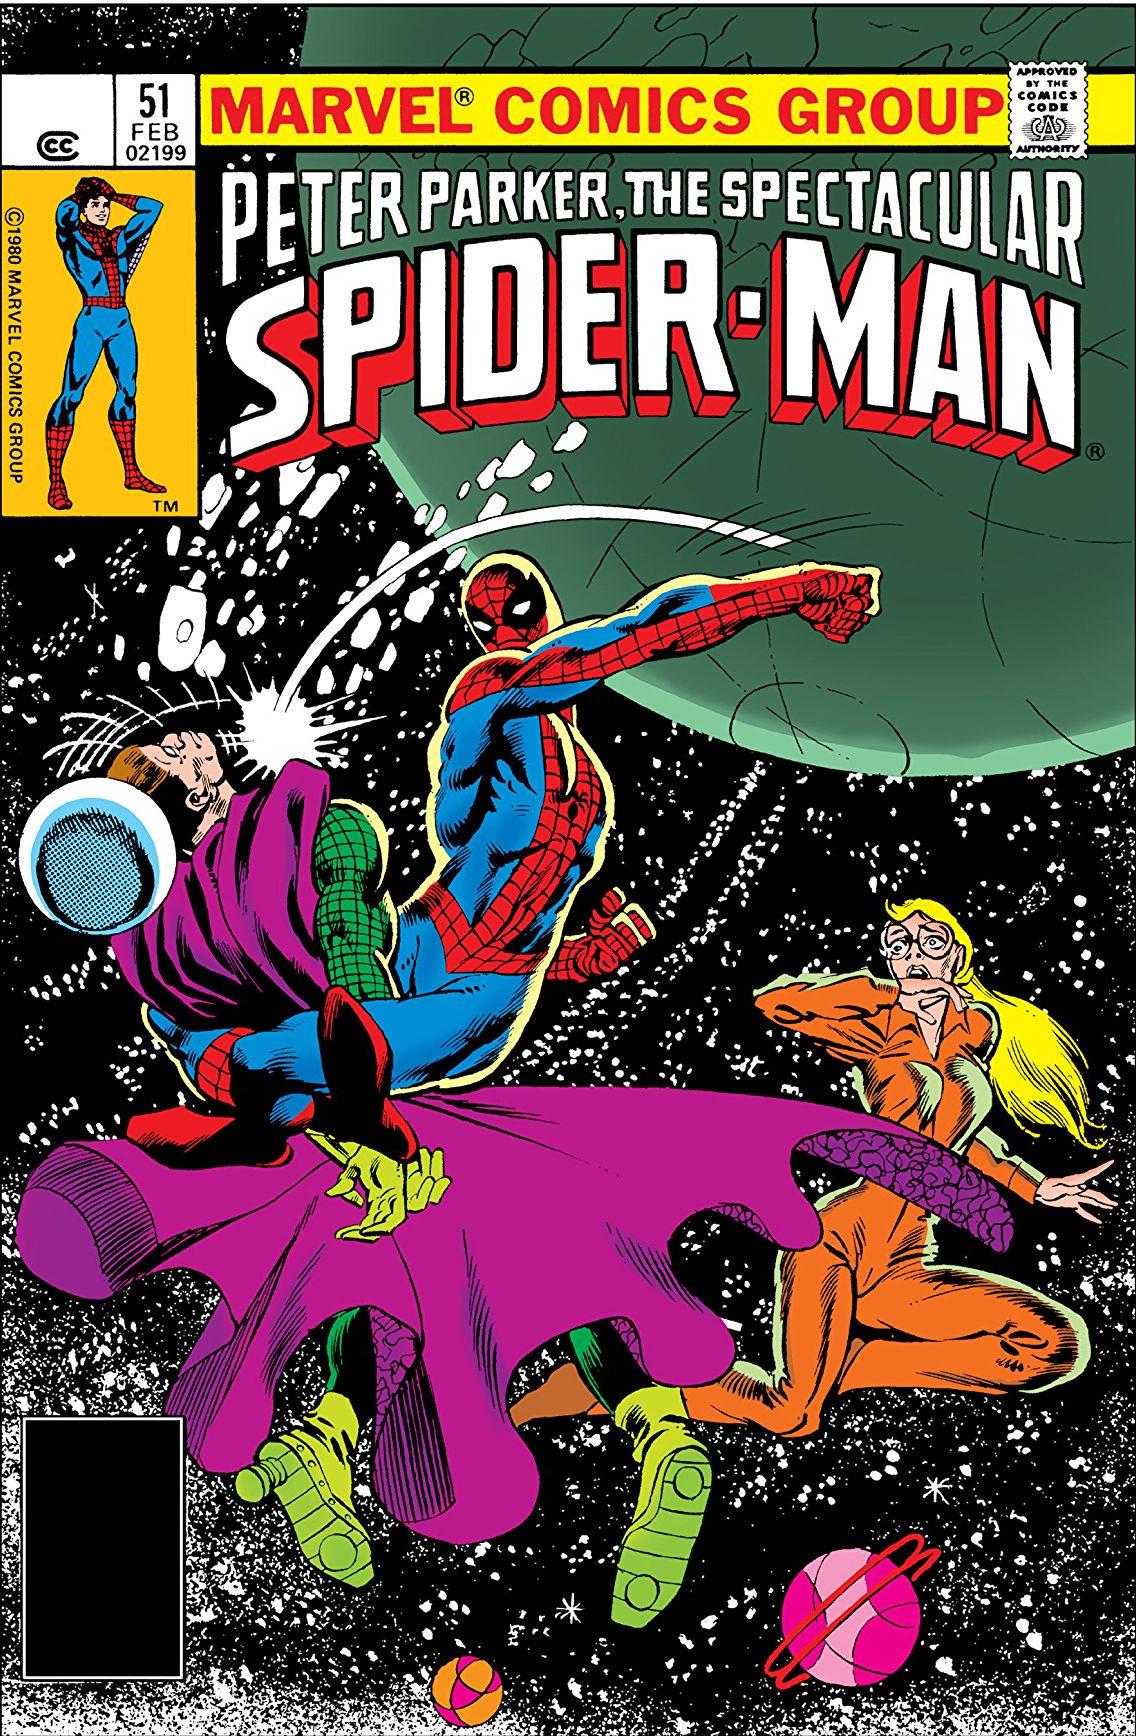 Peter Parker, The Spectacular Spider-Man Vol 1 51